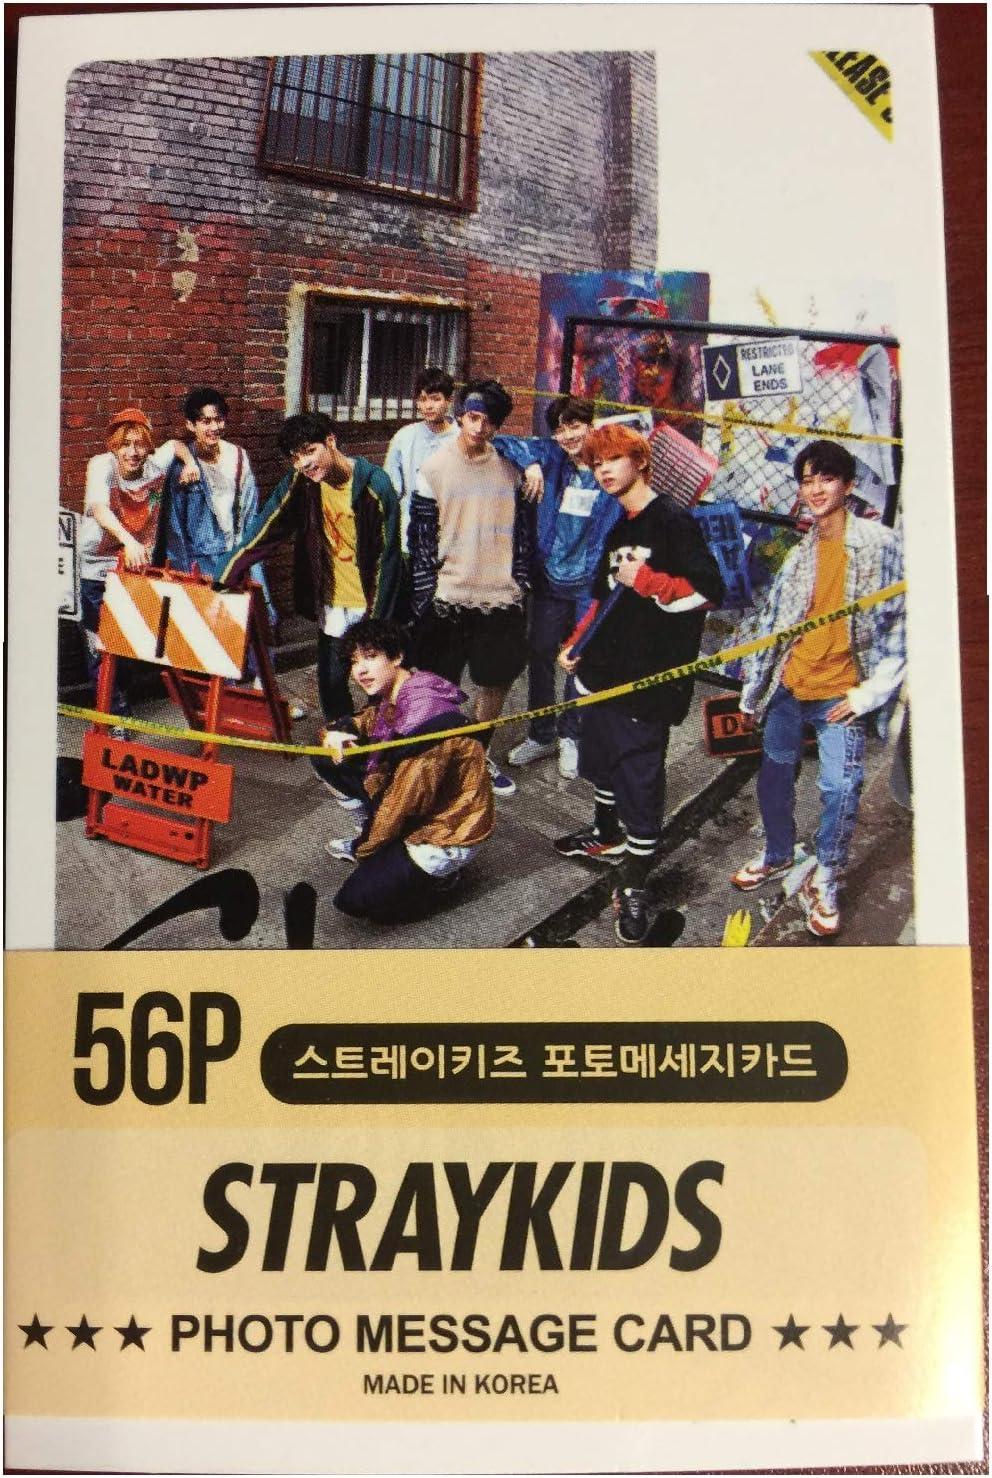 Cookiepretty1971 Kpop Straykids Transparent Photo Cards 25pcs